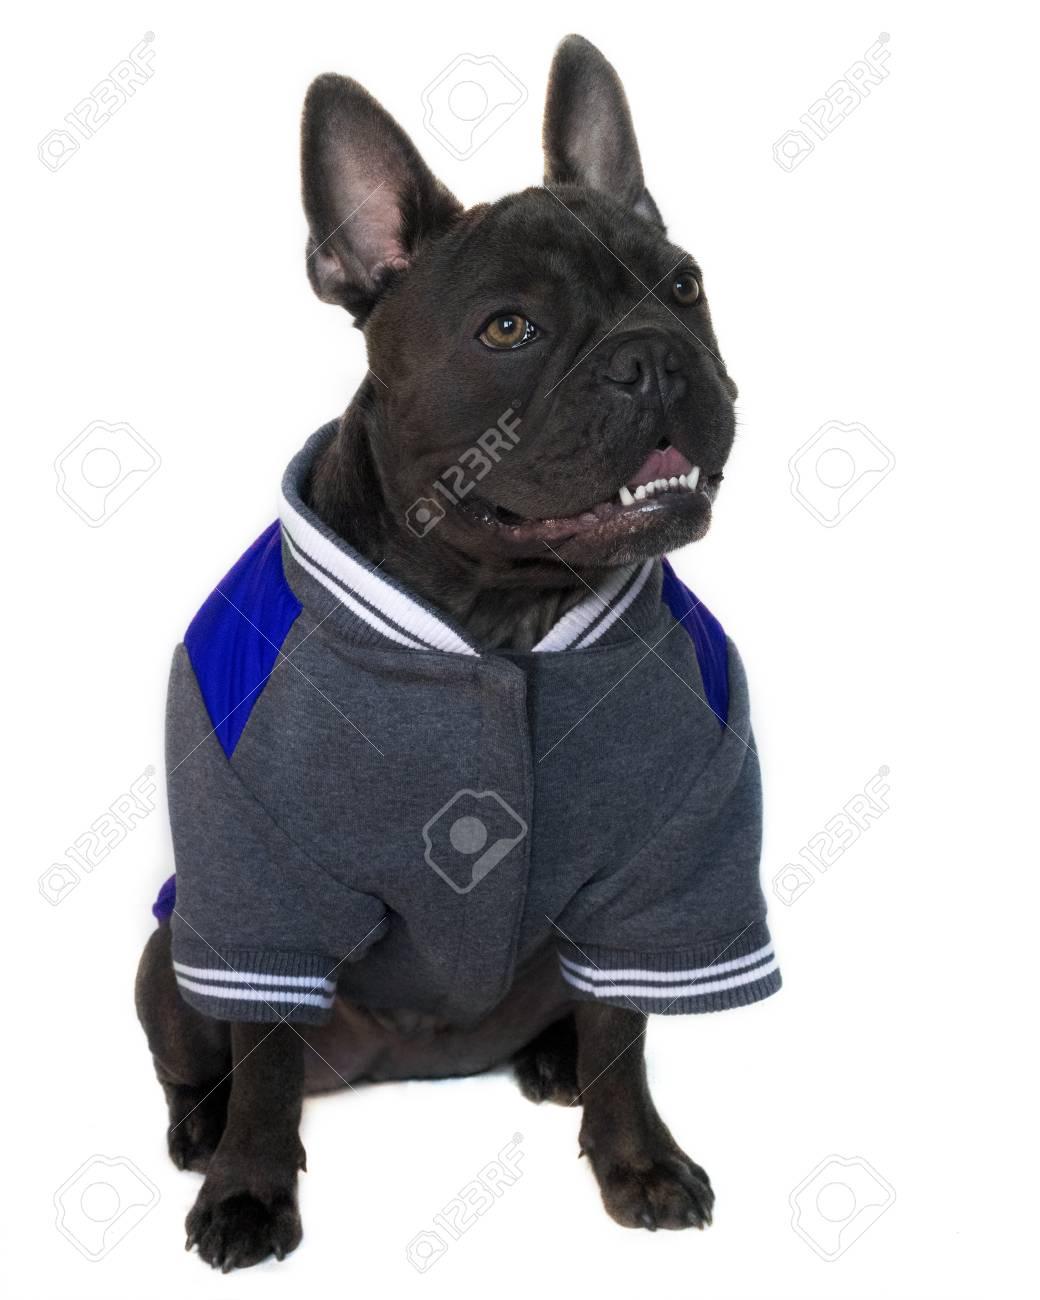 Verbazingwekkend Mascot Type Portrait, Full Body Of A Blue French Bulldog Dressed WU-76